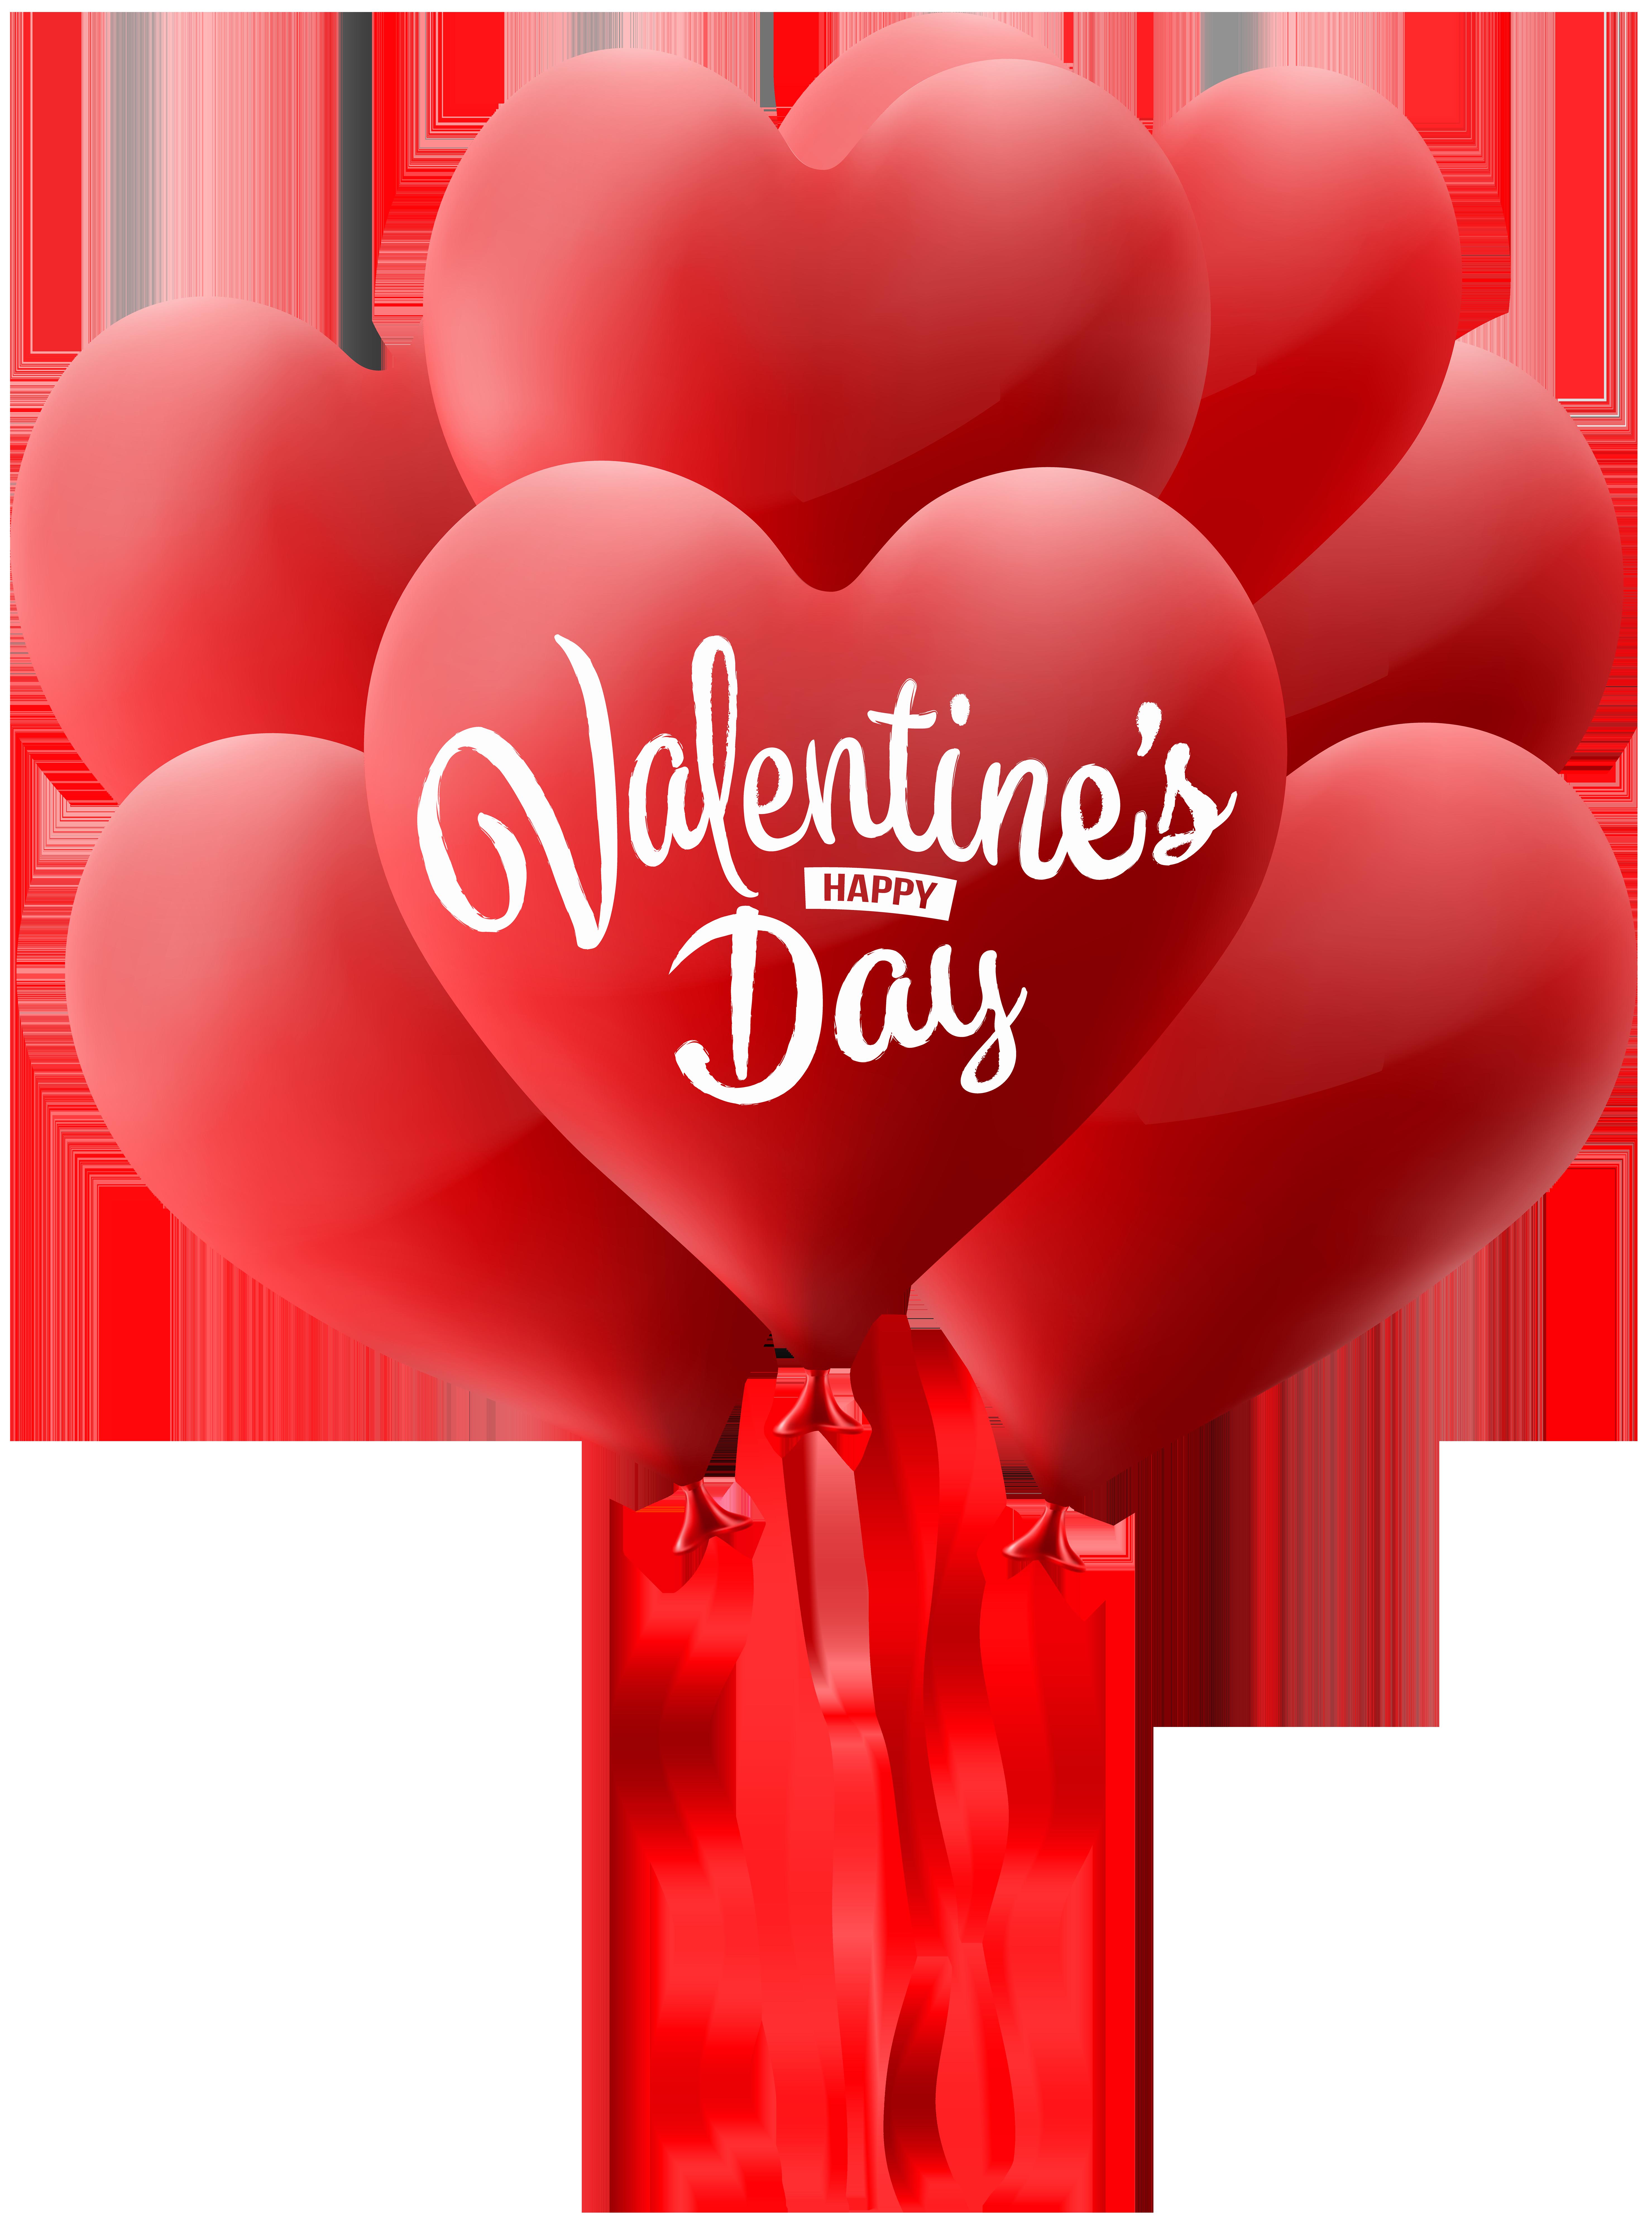 Vday Heart Balloons Clip Art Image.